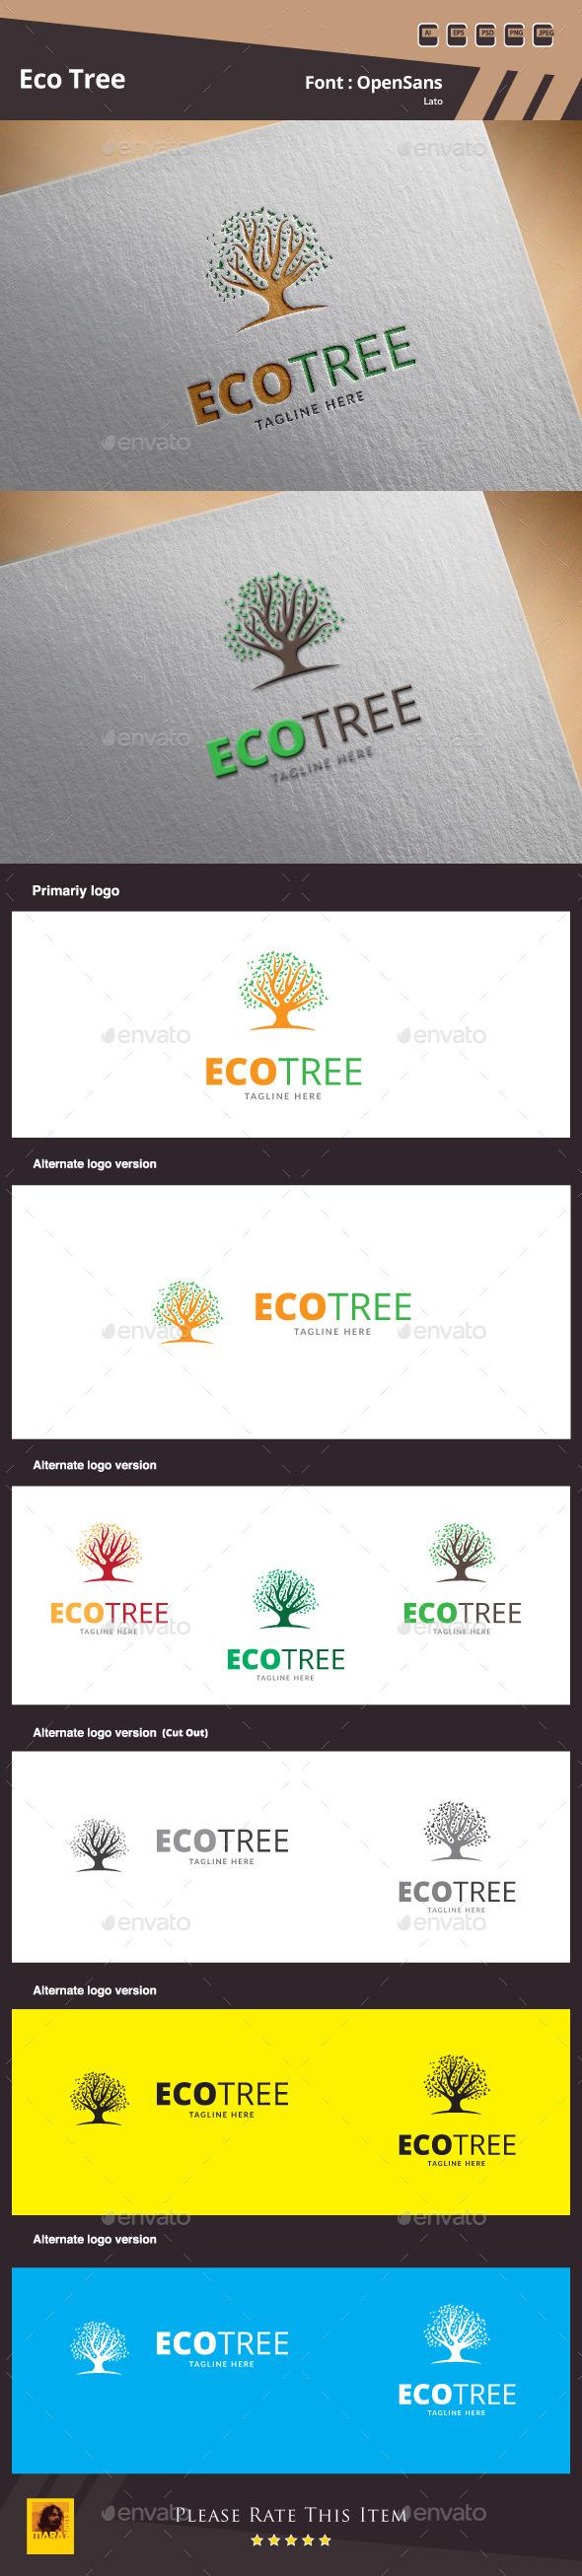 GraphicRiver Eco Tree Logo Template 9980536